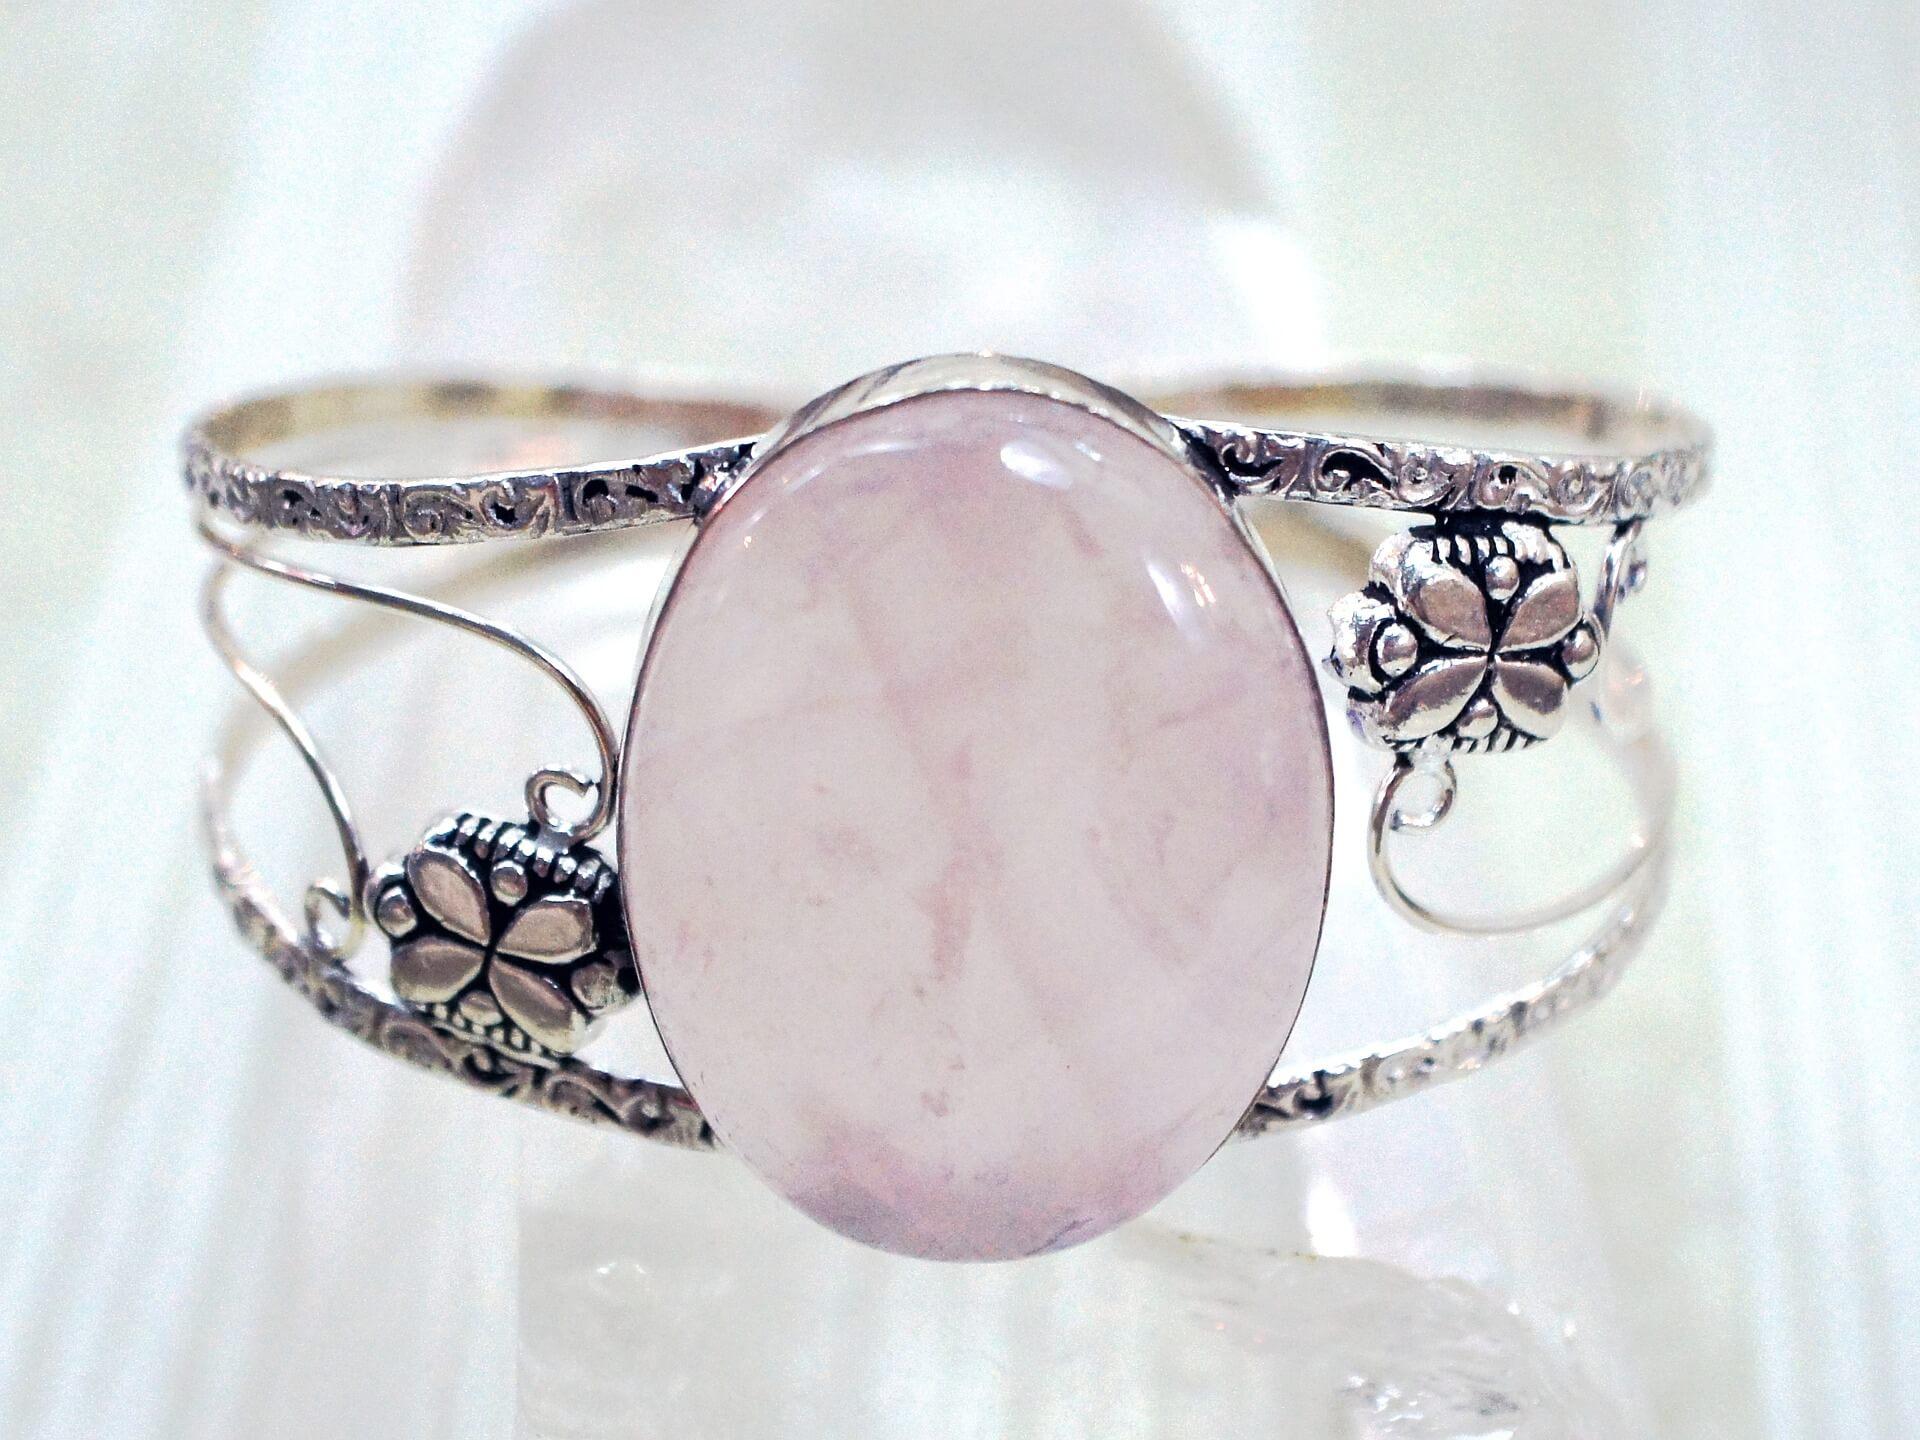 rose-quartz-jewelry-guide